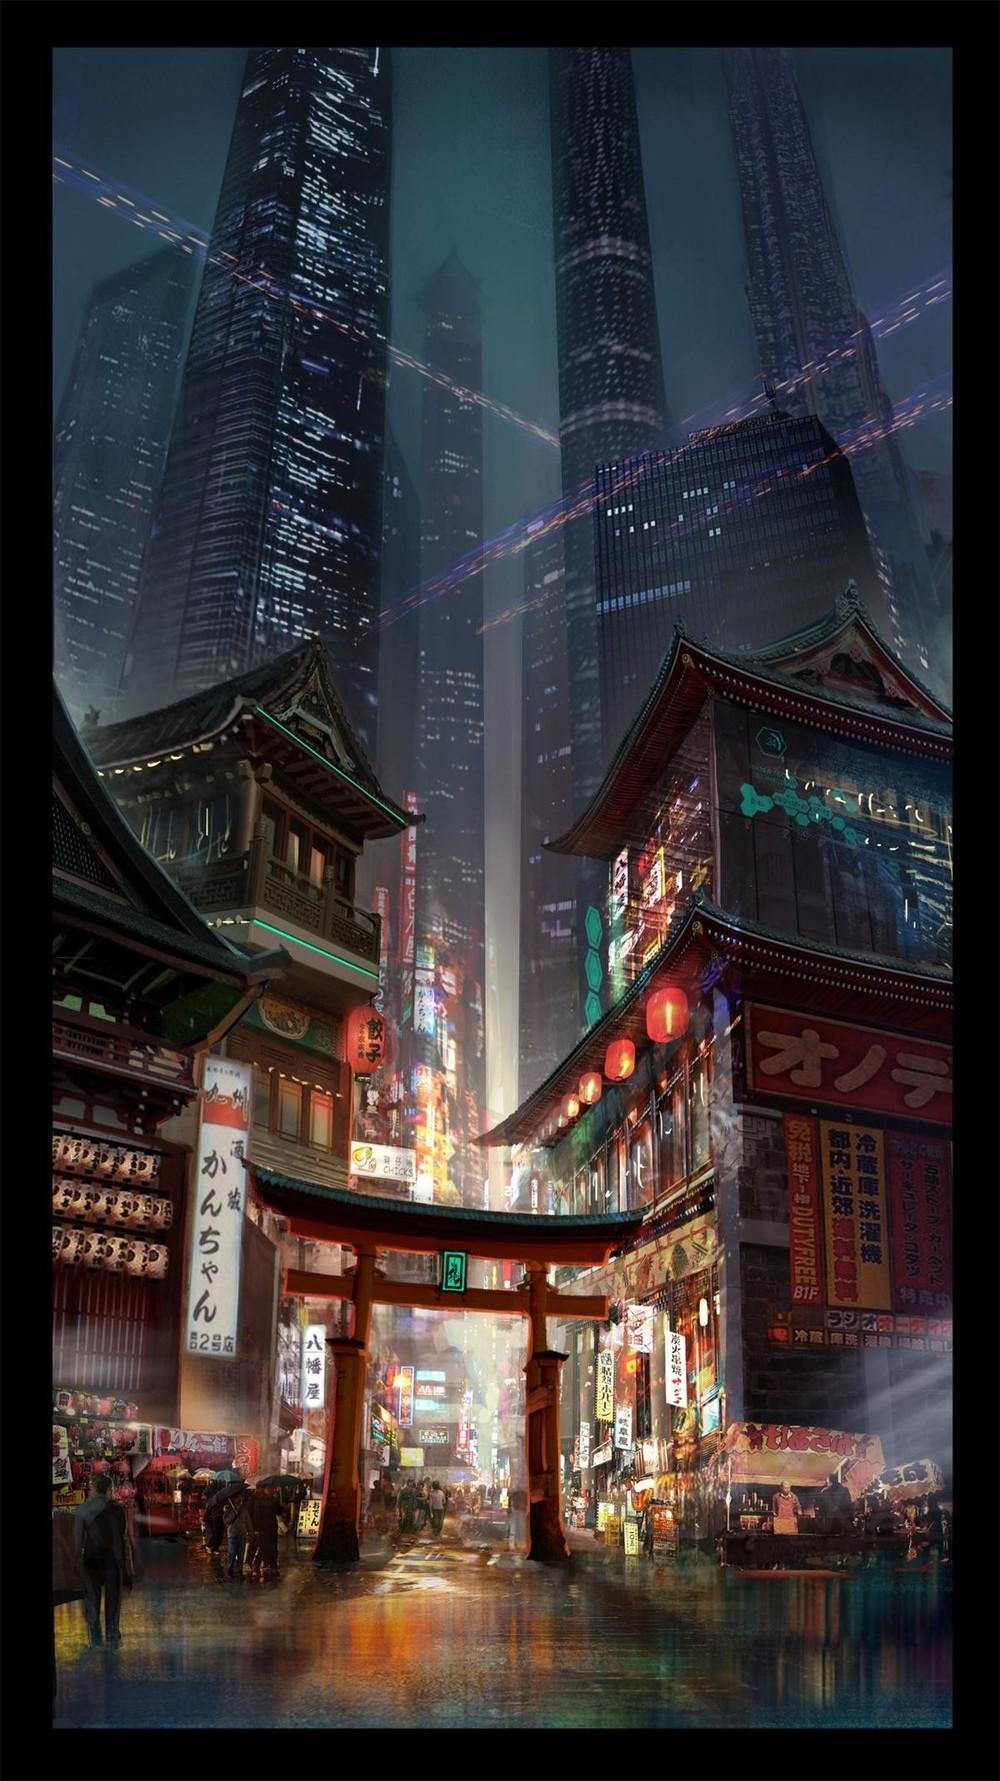 XINGHANG HU © 2016 #Cyberpunk #DeliDaPersy